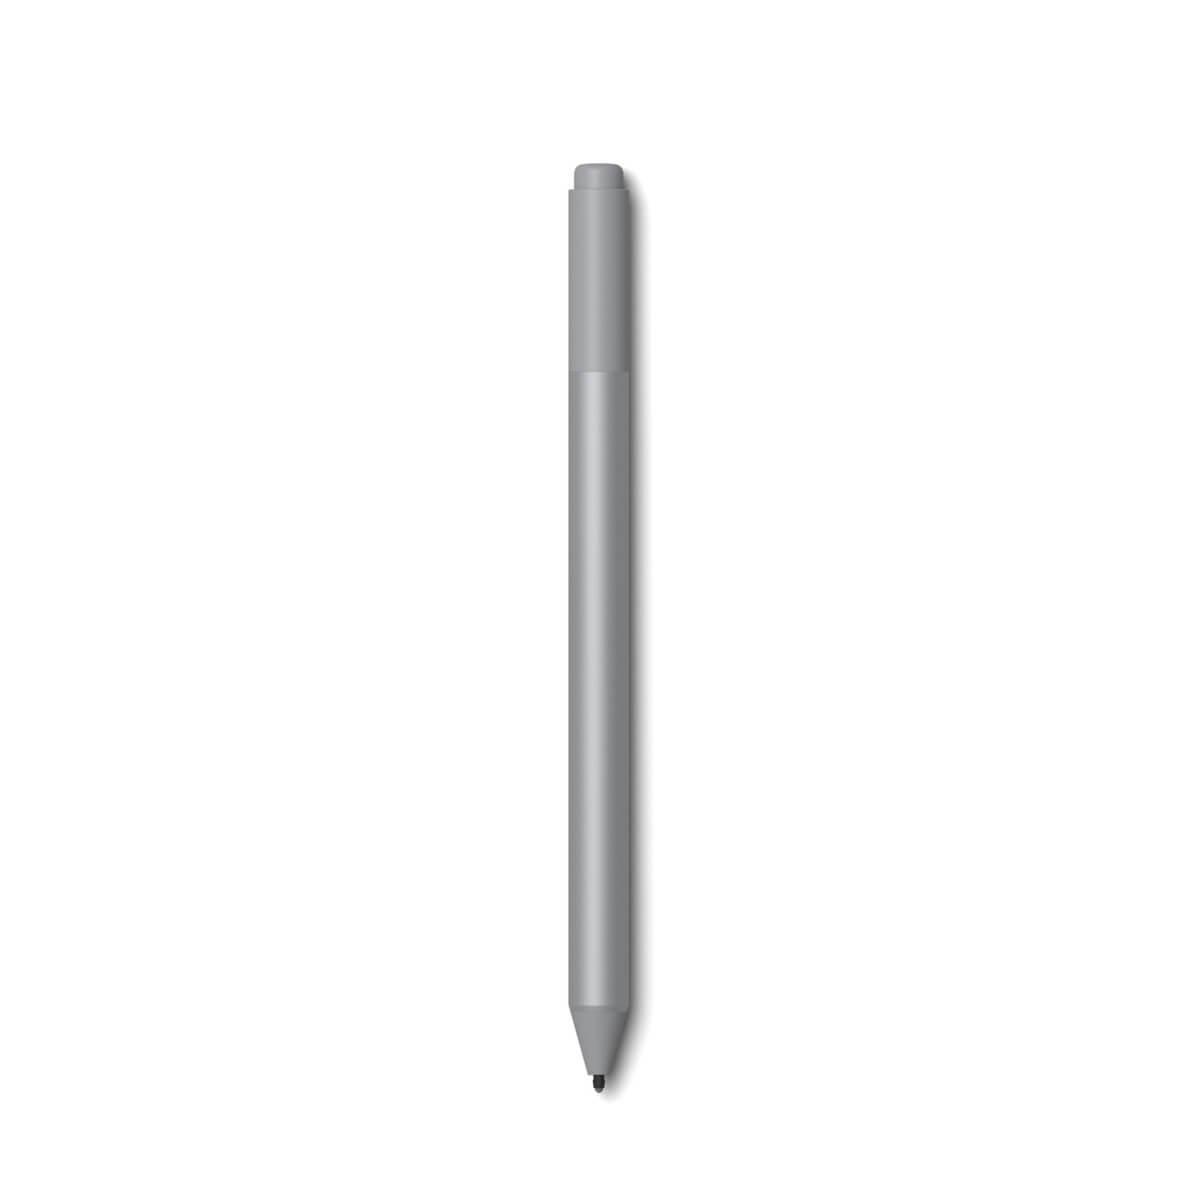 Microsoft bringt neues Surface Pro